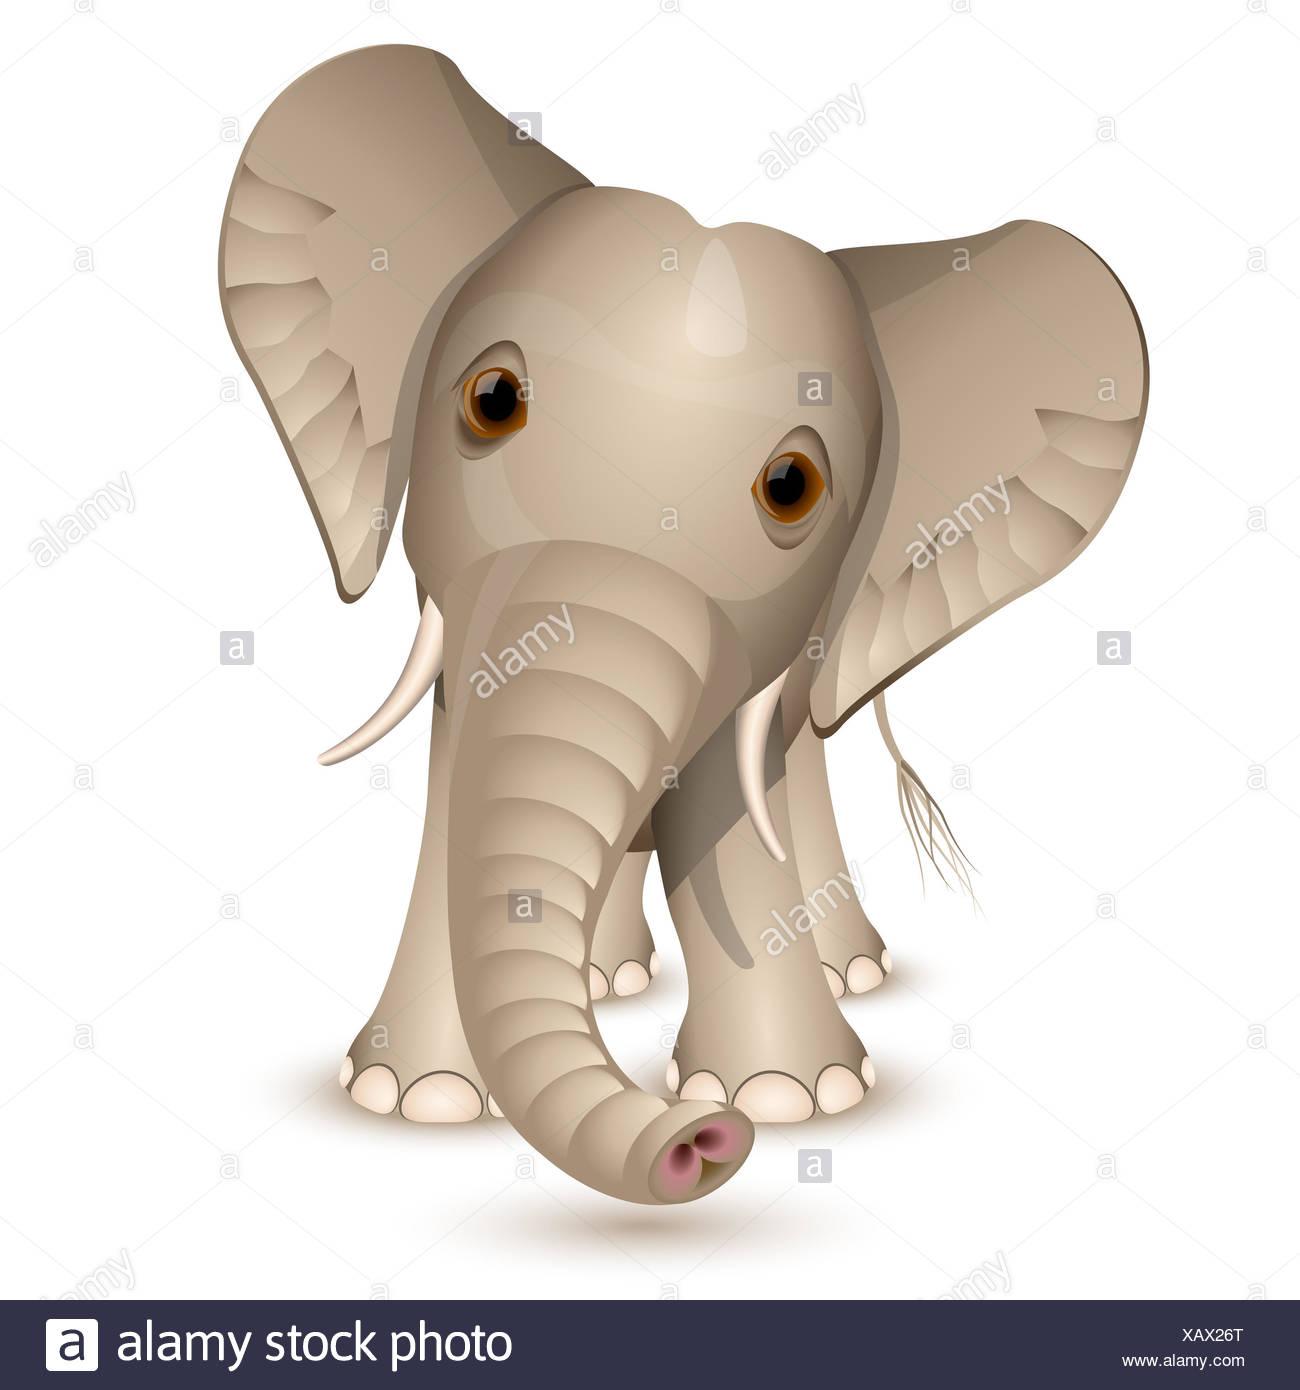 Nett Süße Elefanten Malvorlagen Fotos - Malvorlagen Ideen - blogsbr.info